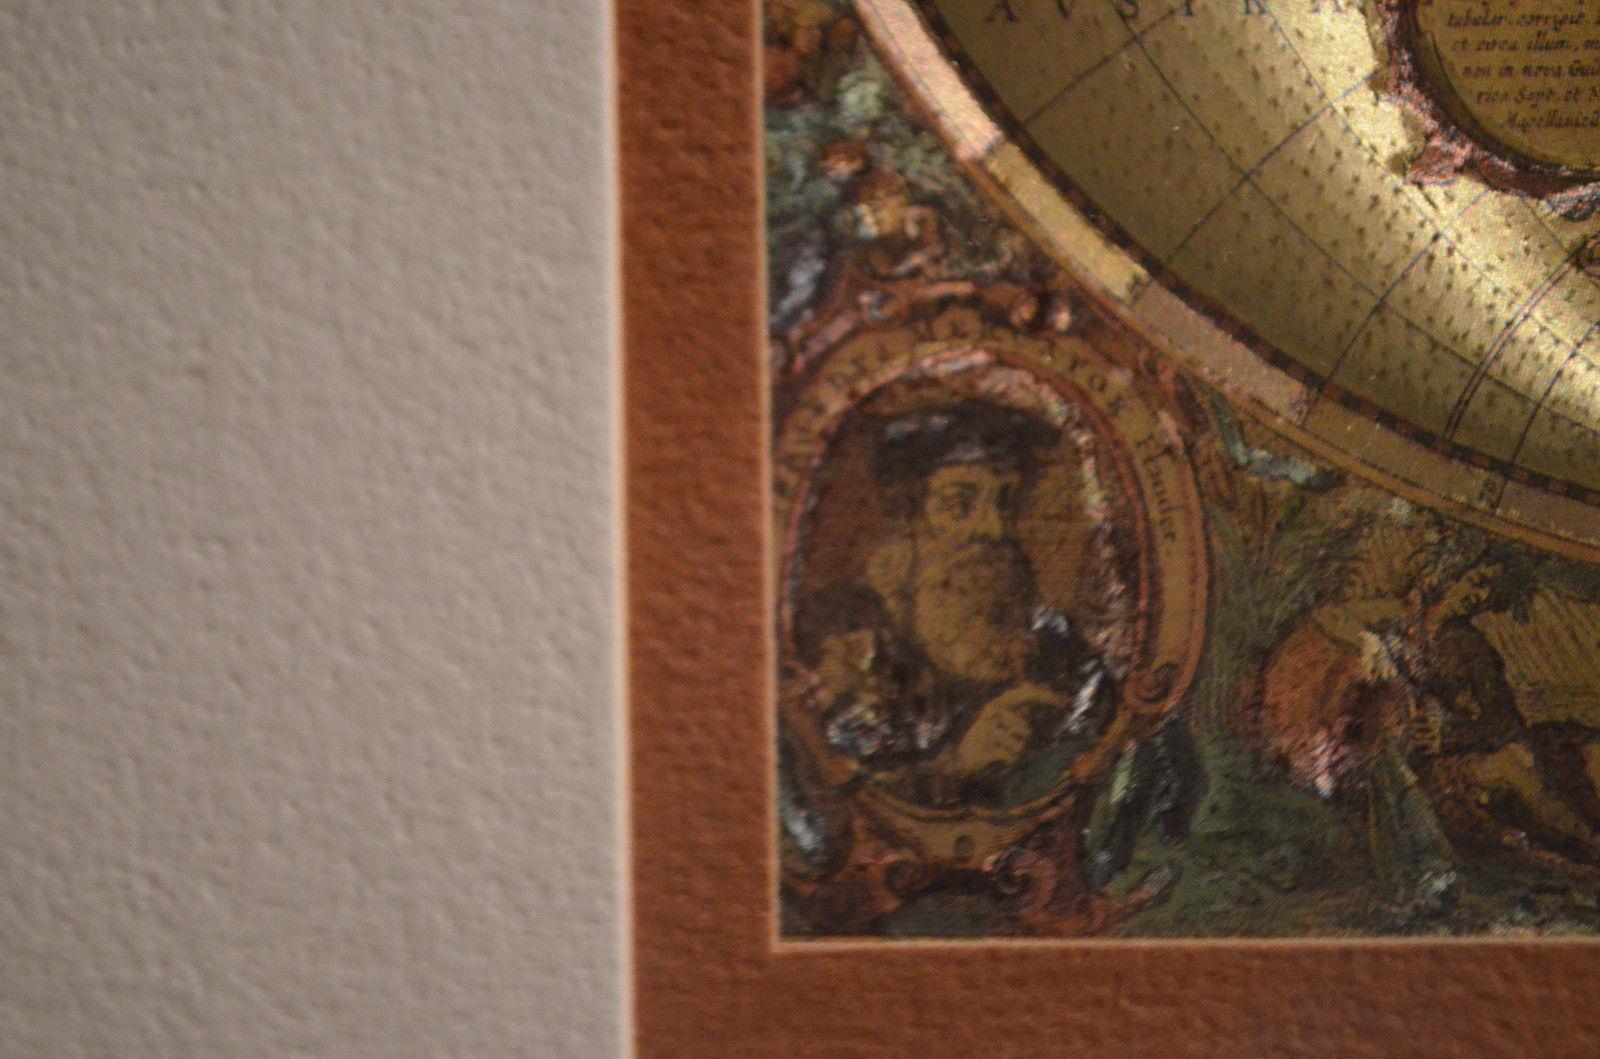 """NOVA TOTIUS TERRARUM ORBIS GEOGRAPHICA AC HYDROGRPHICA TABULA"" Old world Map"